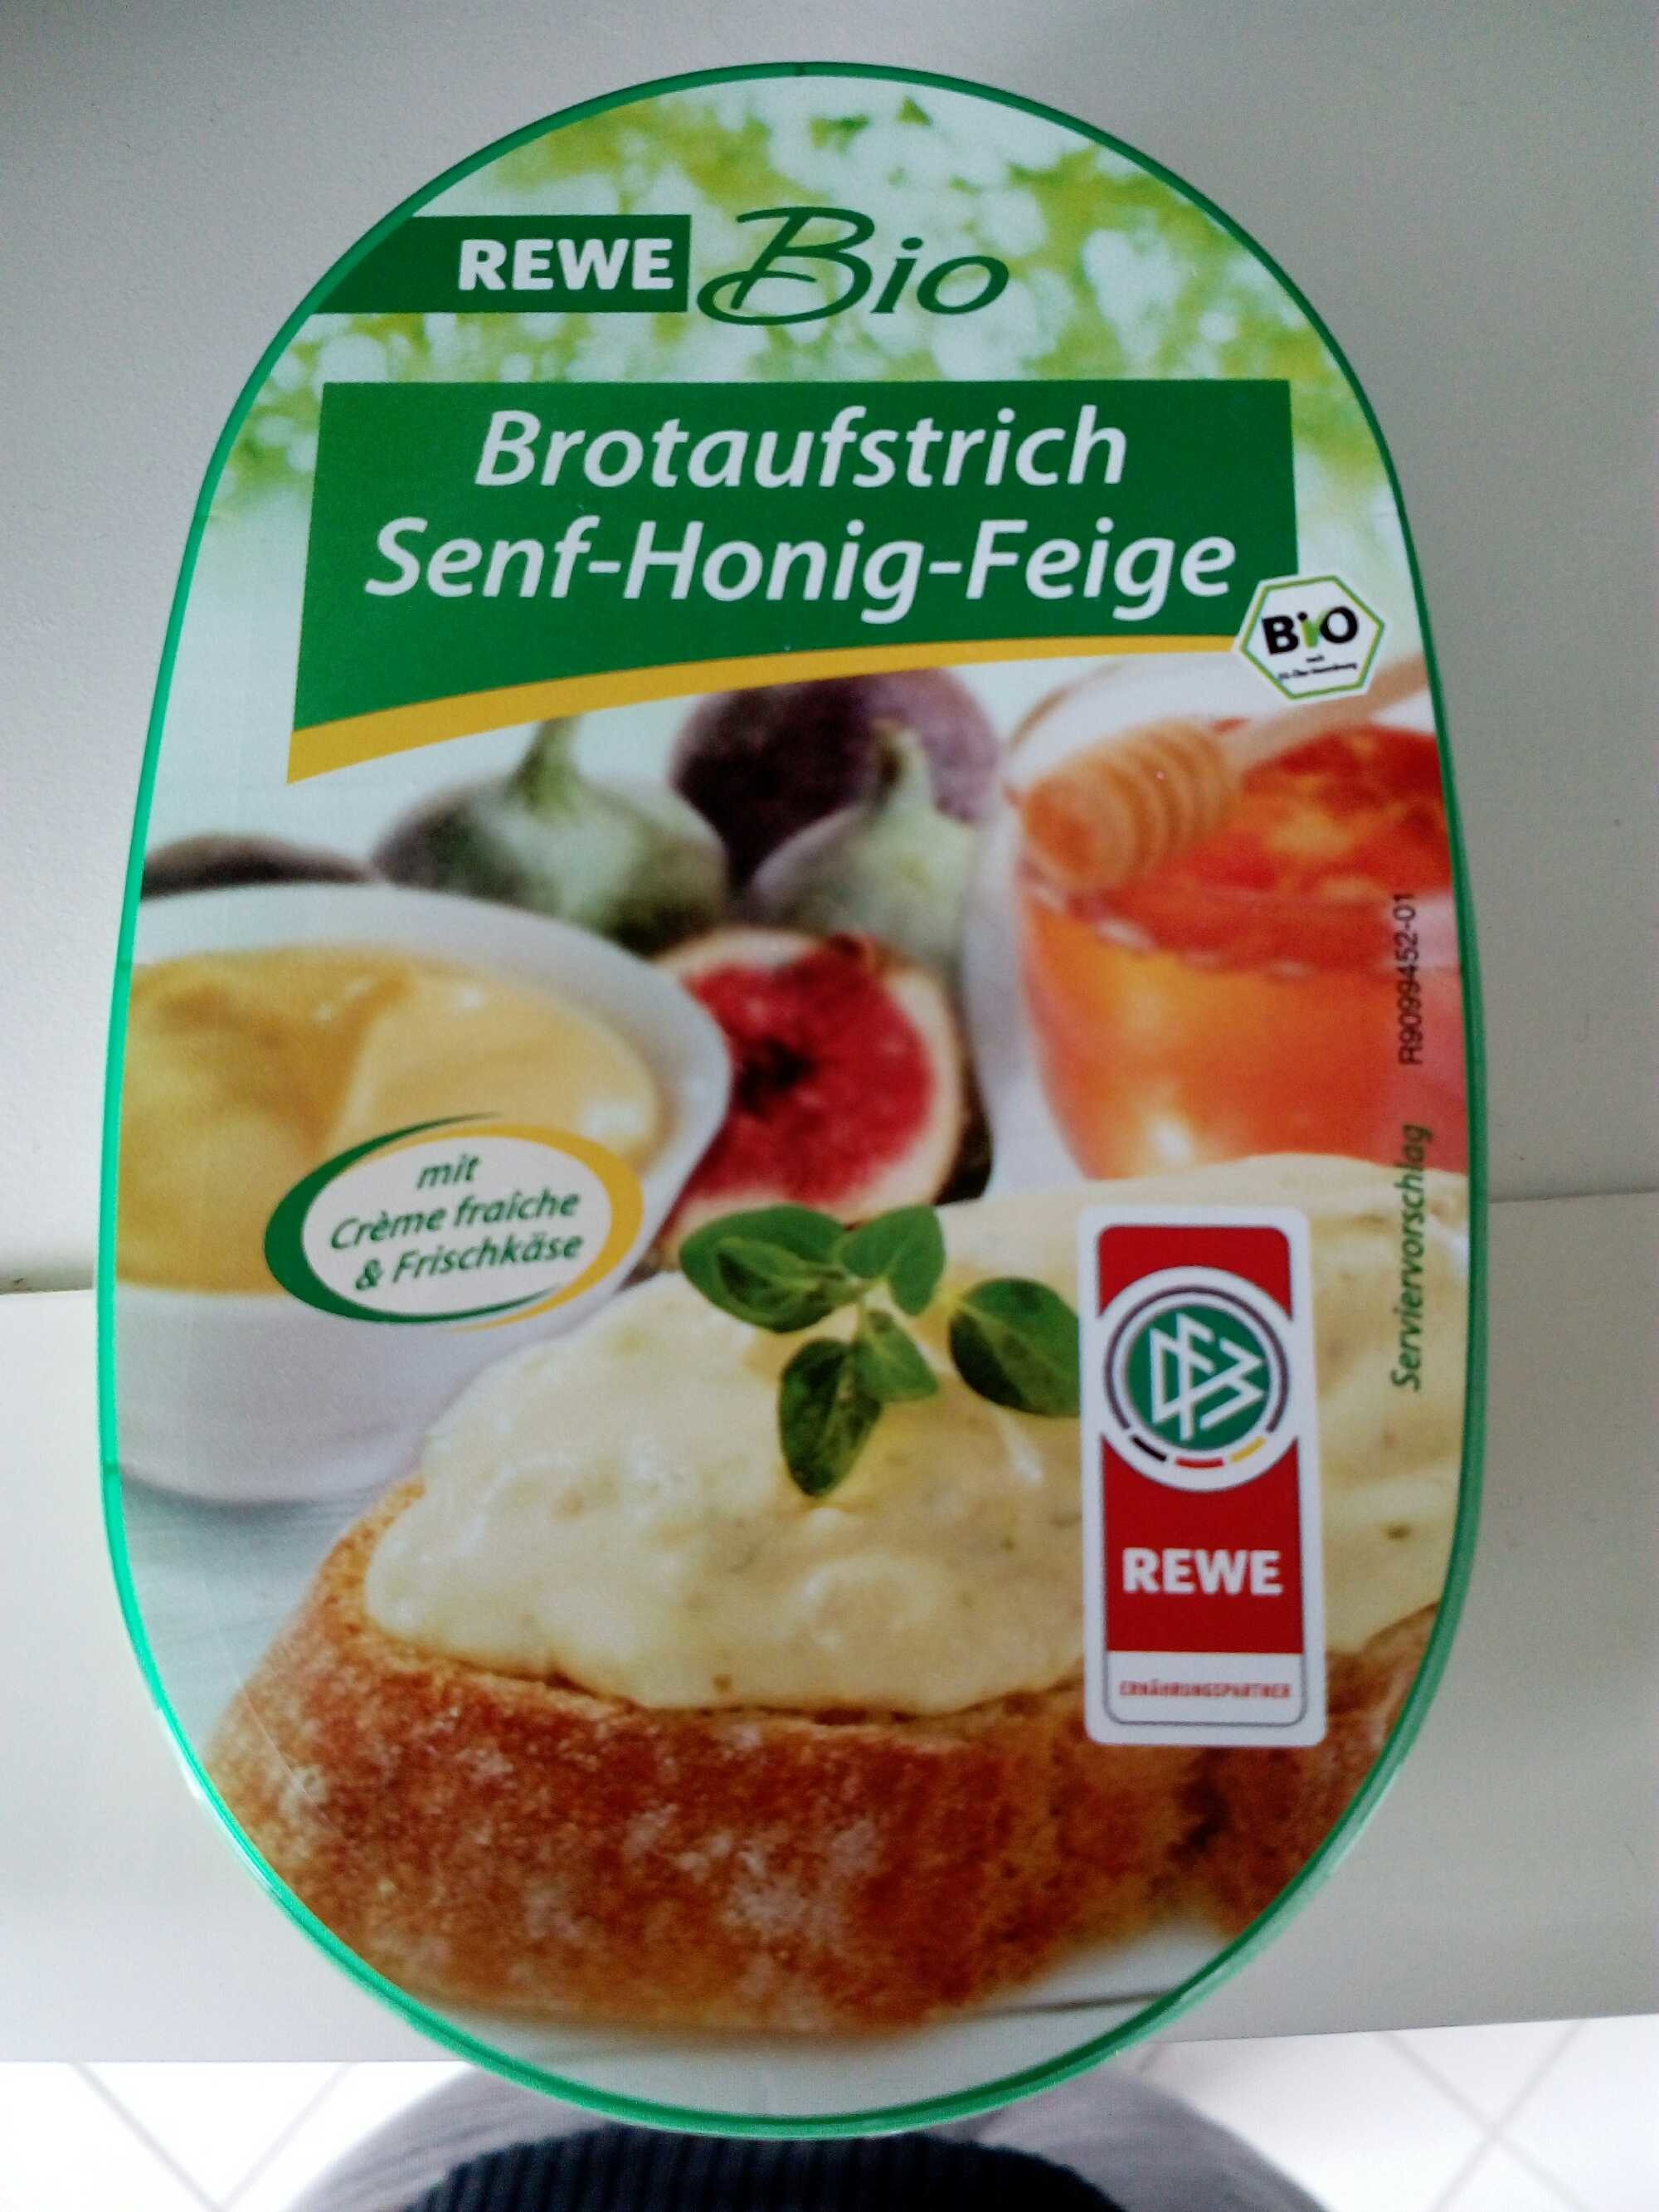 Brotaufstrich Senf-Honig-Feige - Product